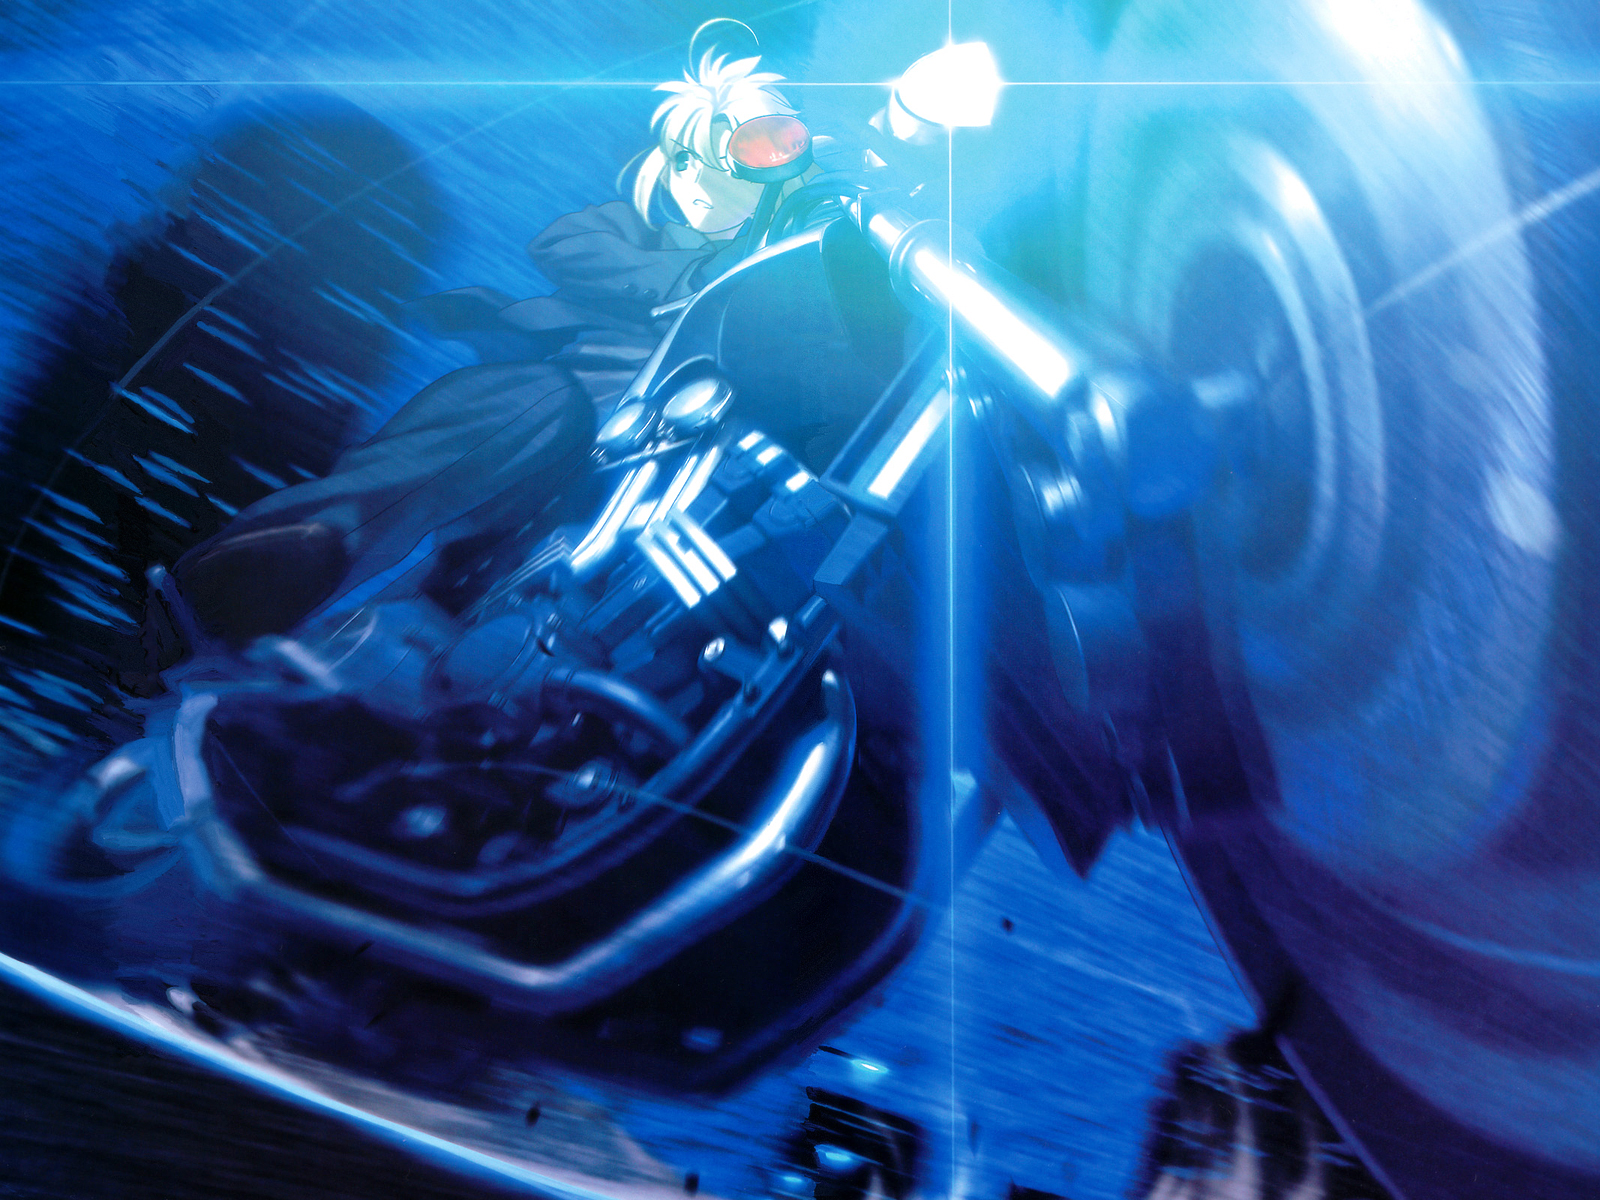 artoria_pendragon_(all) blue fate_(series) fate/stay_night fate/zero motorcycle saber suit tie